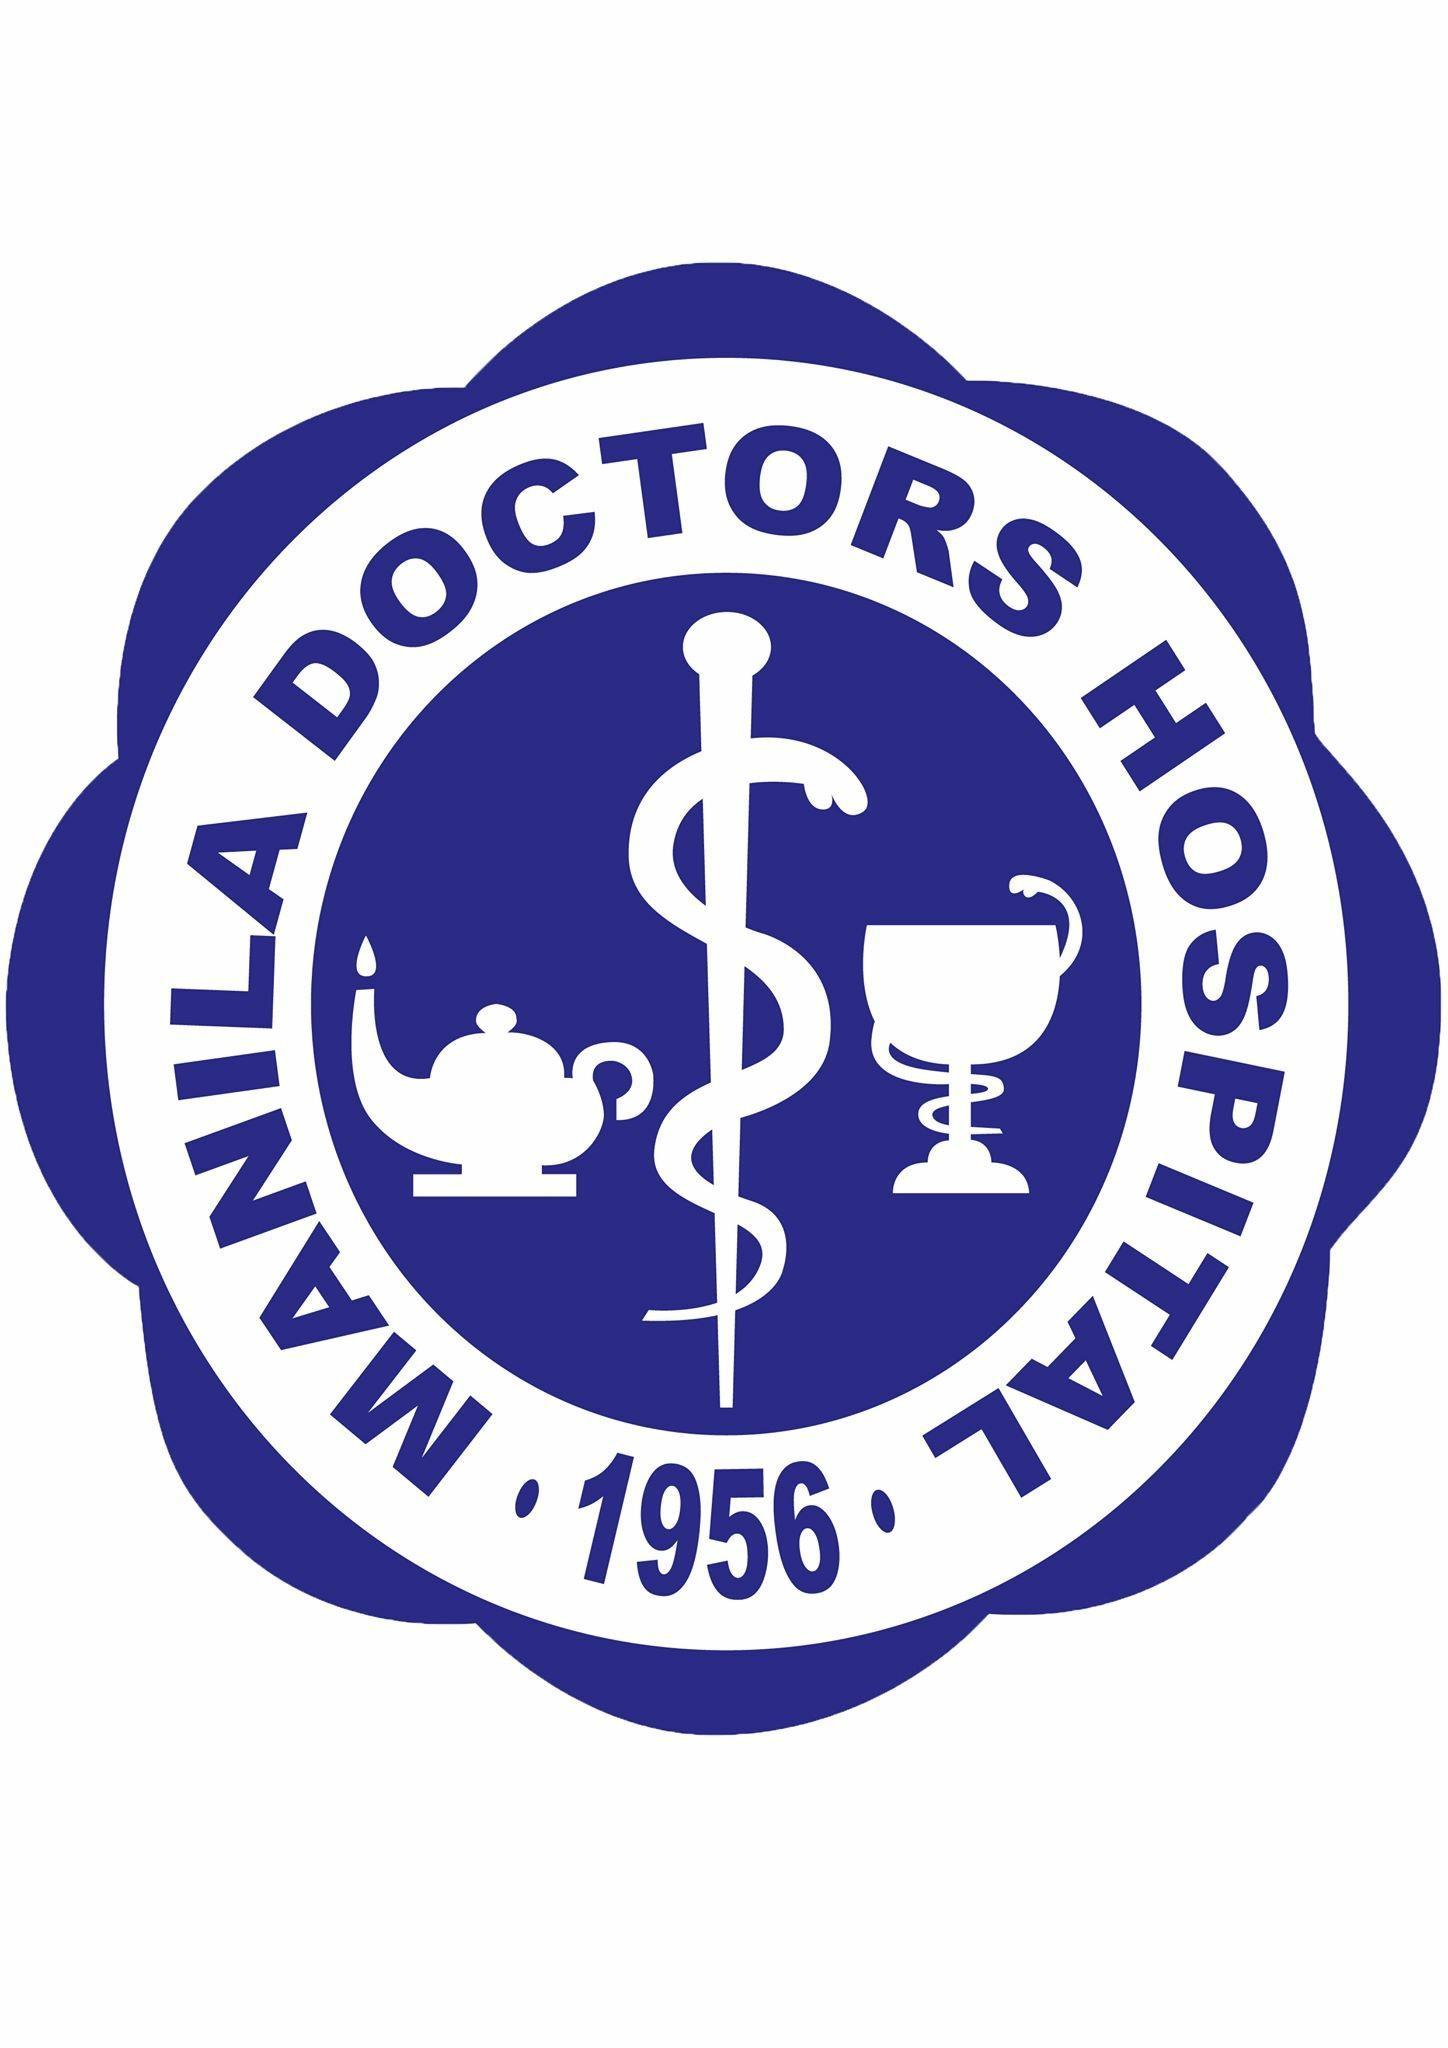 Manila Doctors Hospital - Room No. 607